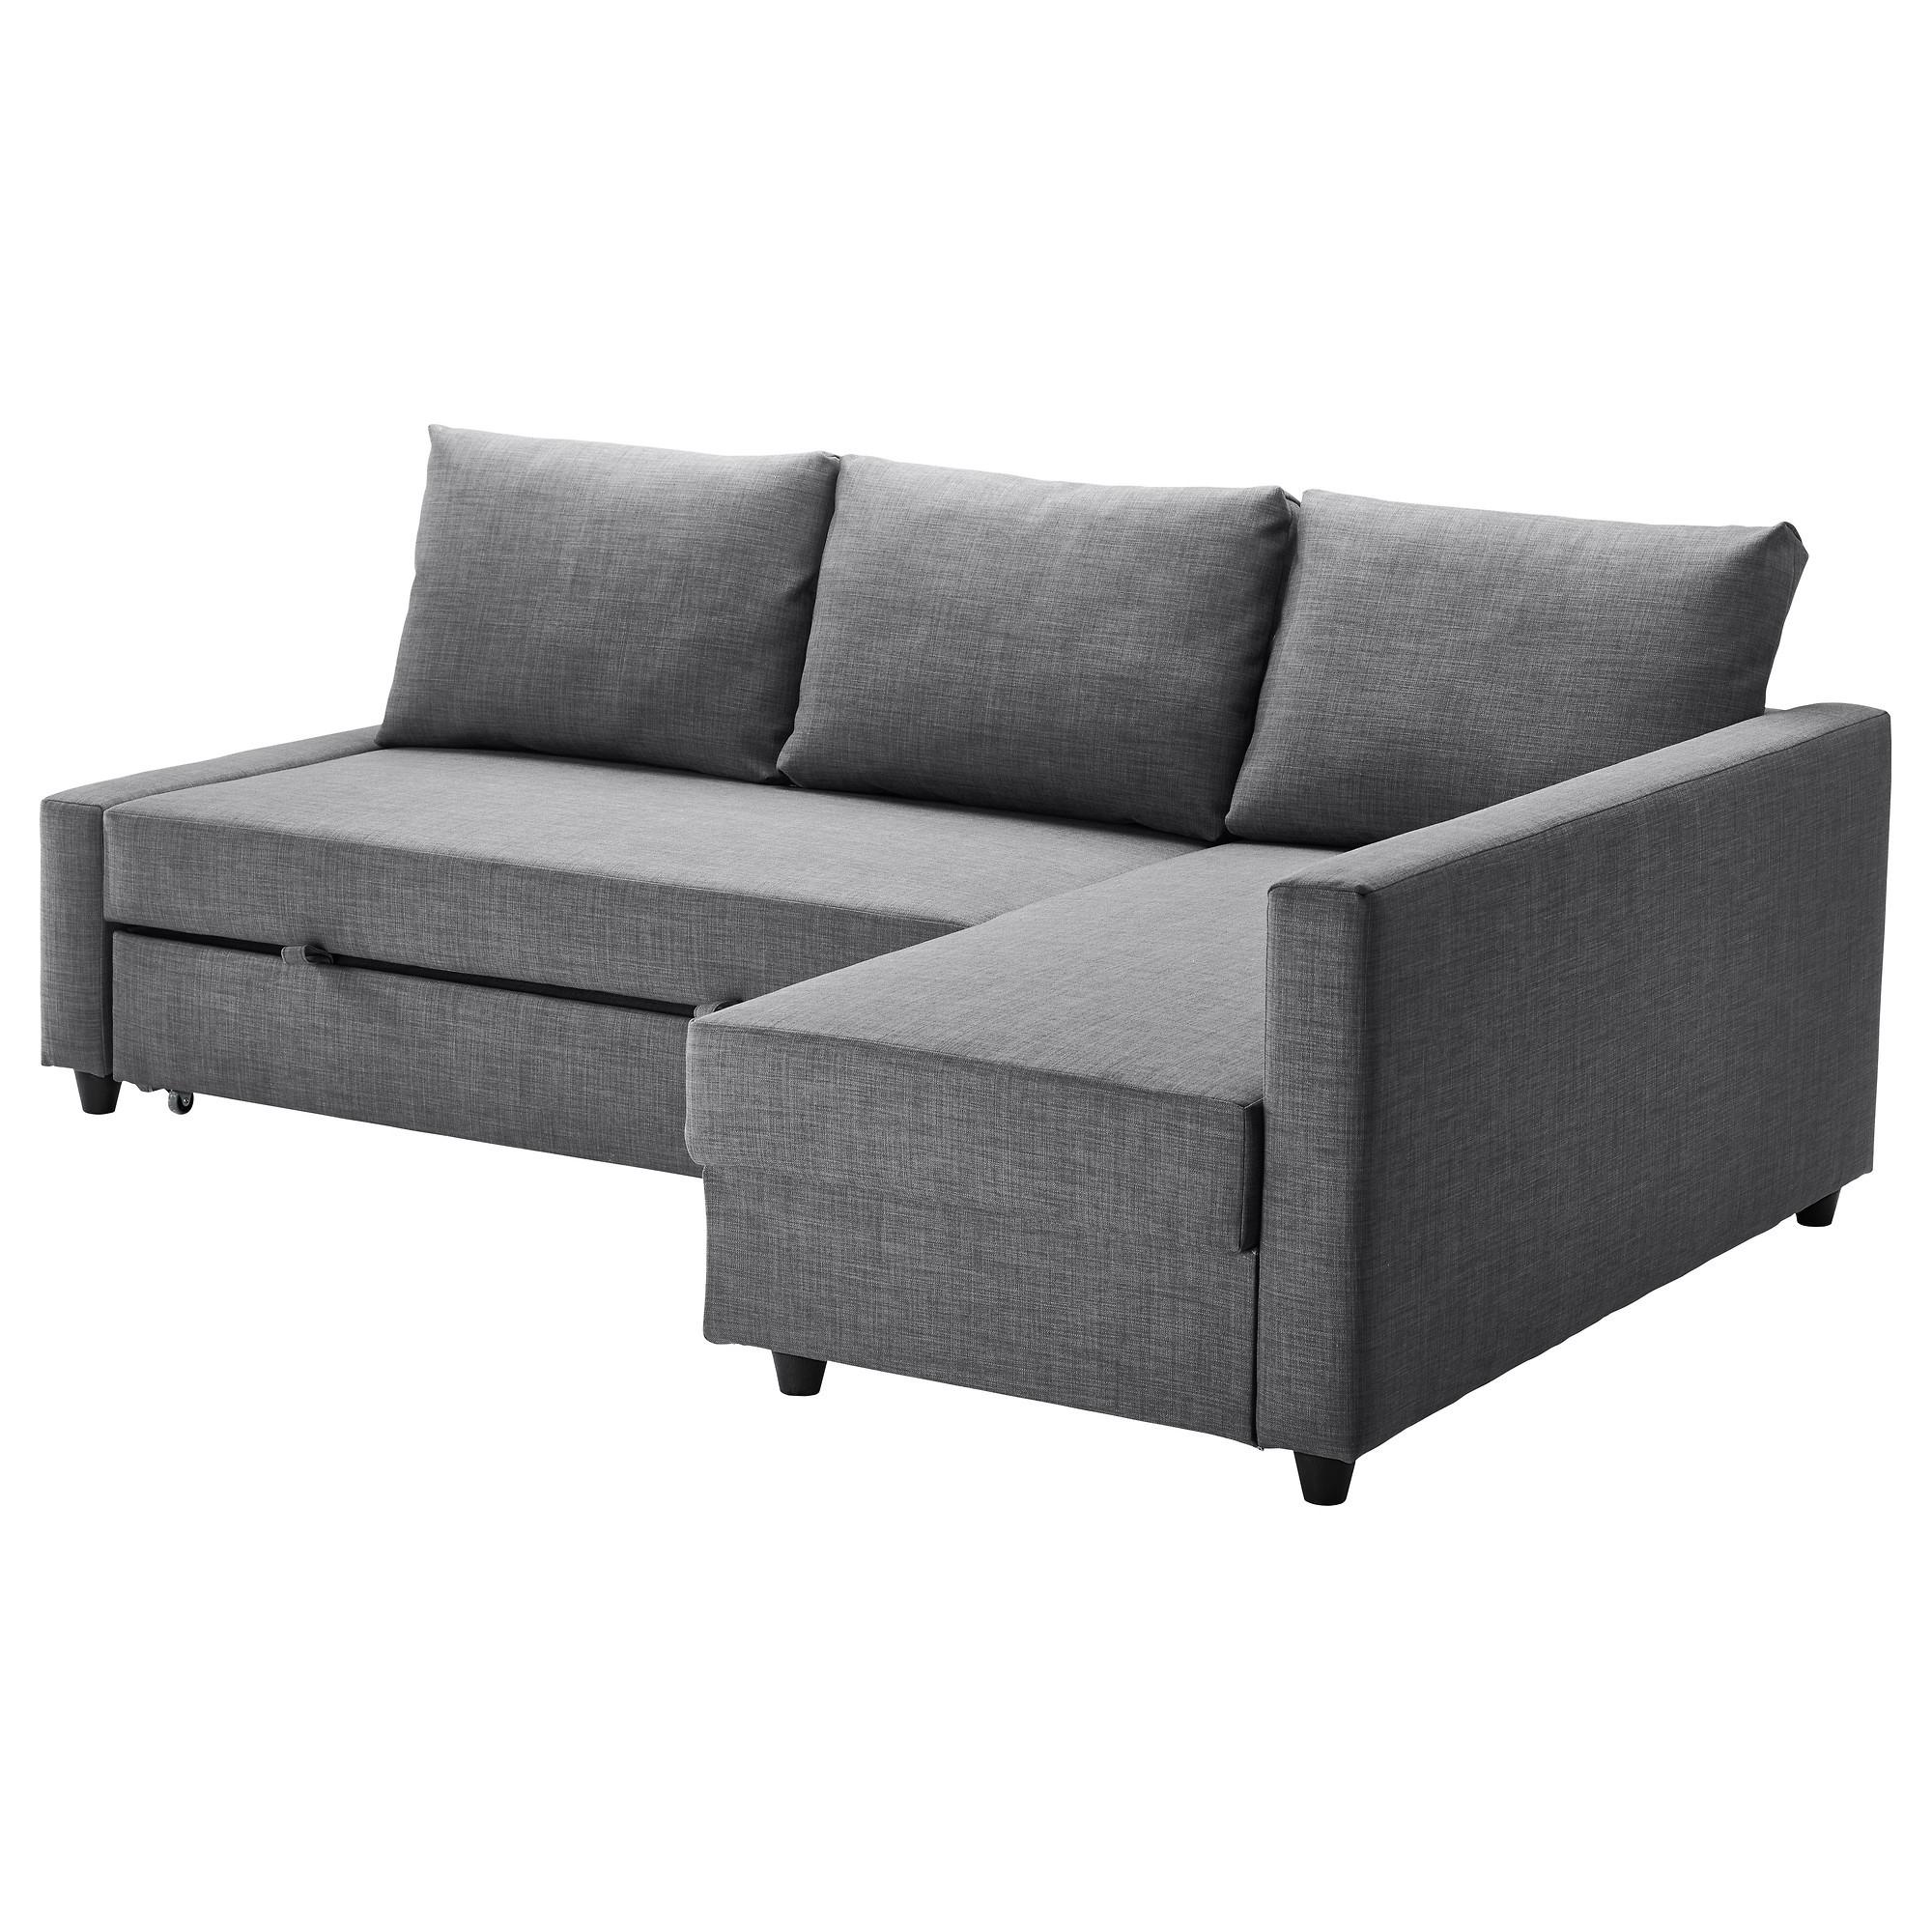 Interesting Sectional Sleeper Sofa Ikea Awesome Cheap Furniture for Ikea Sectional Sleeper Sofas